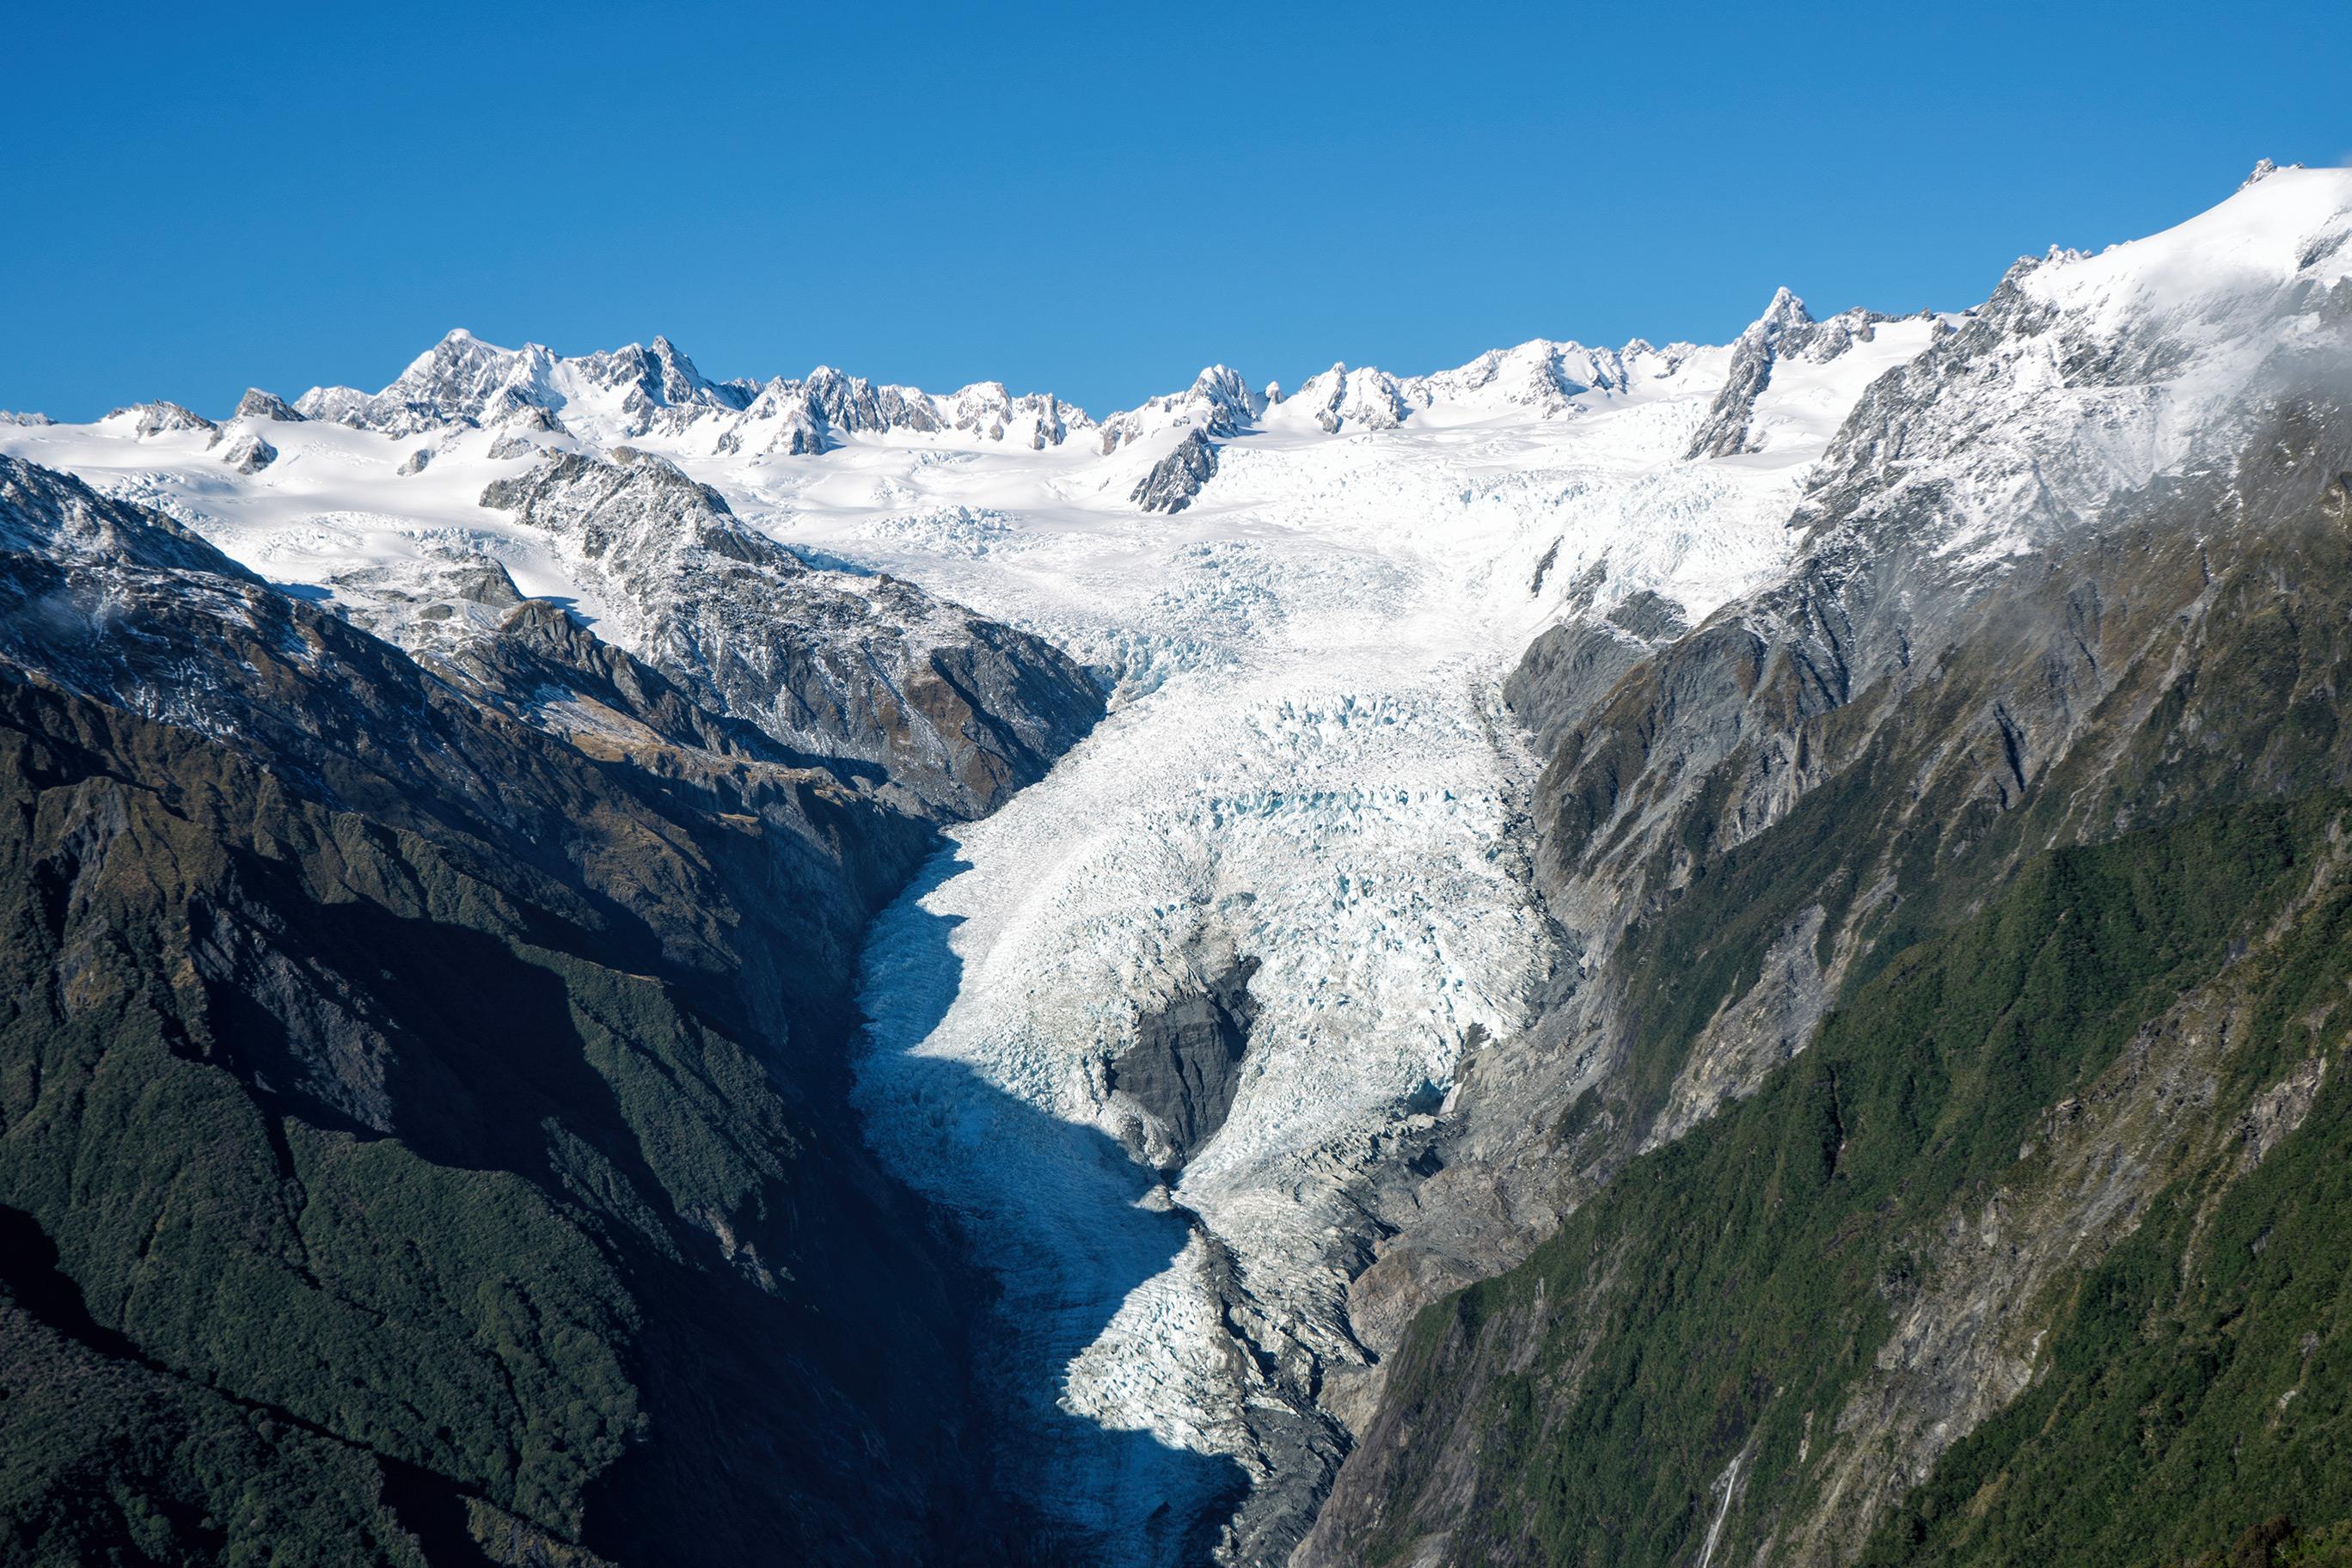 Franz Josef Glacier Alex Knob Track View Of Glacier And Southern Alps